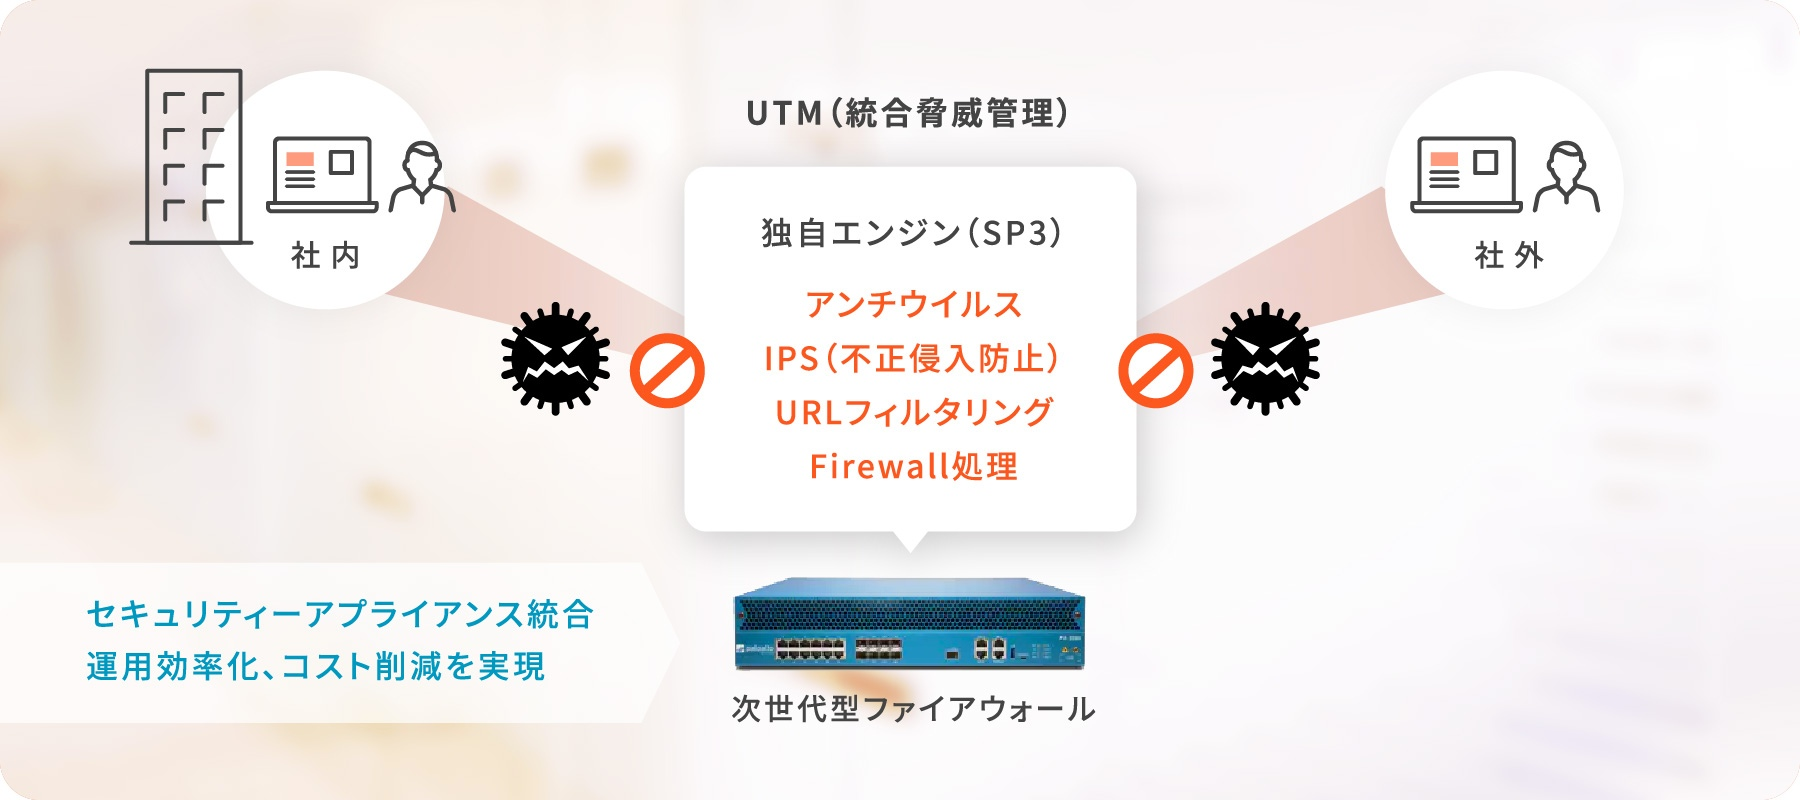 UTM(統合脅威管理)独自エンジン(SP3)・アンチウイルス・IPS(不正侵入防止)・URLフィルタリング・Firewall処理 次世代型ファイアウォール セキュリティーアプライアンス統合 運用効率化、コスト削減を実現